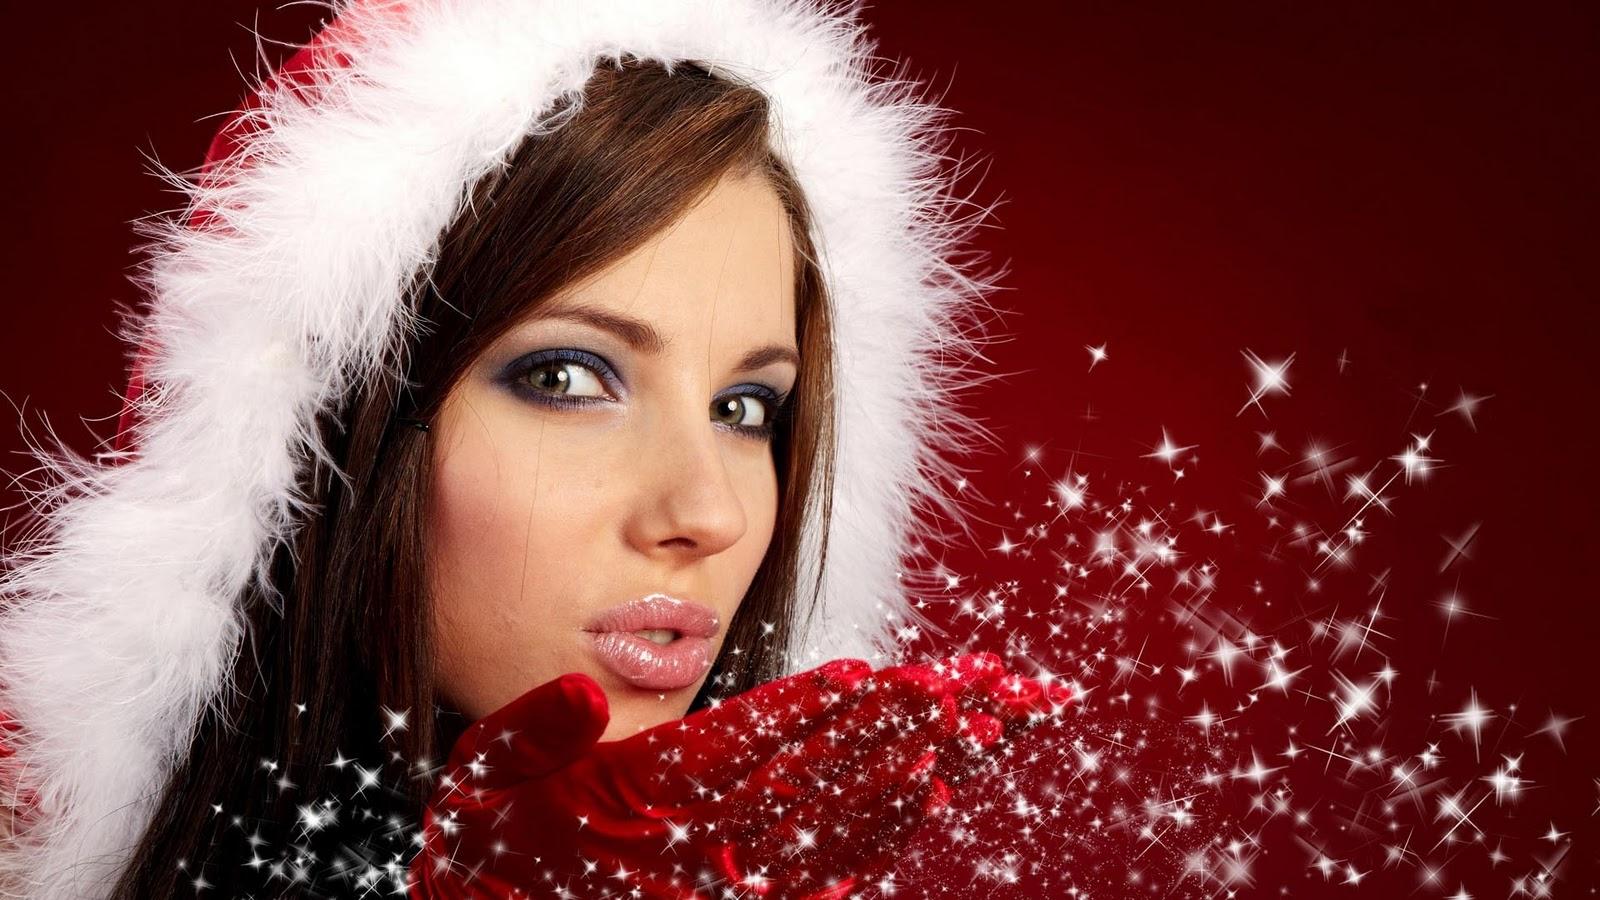 Christmas desktop sexy wallpaper